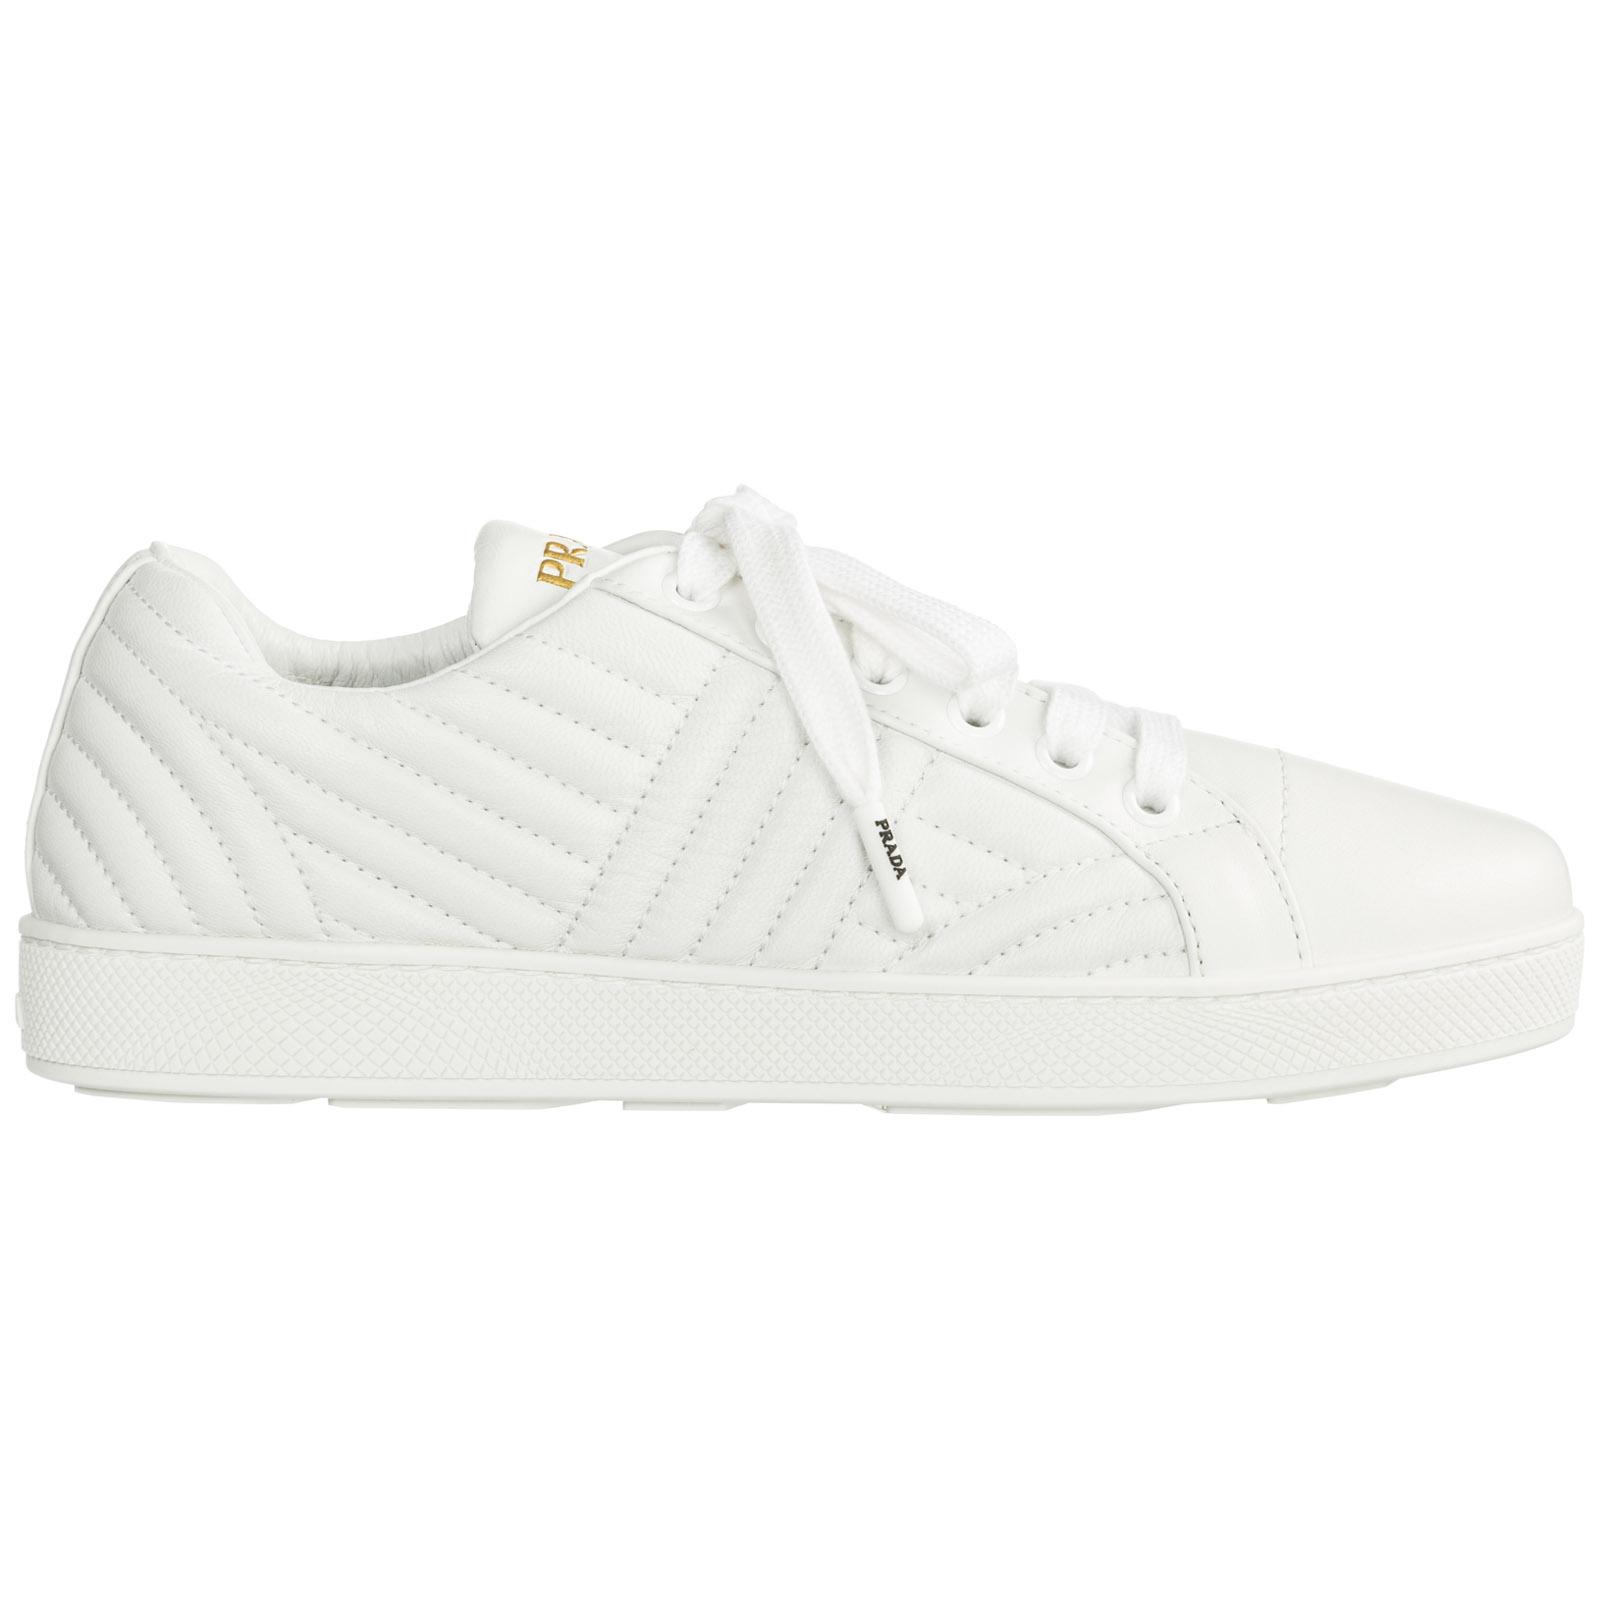 8cb66c82d467 Sneakers Prada 1E254L 77F F0009 F 005 bianco